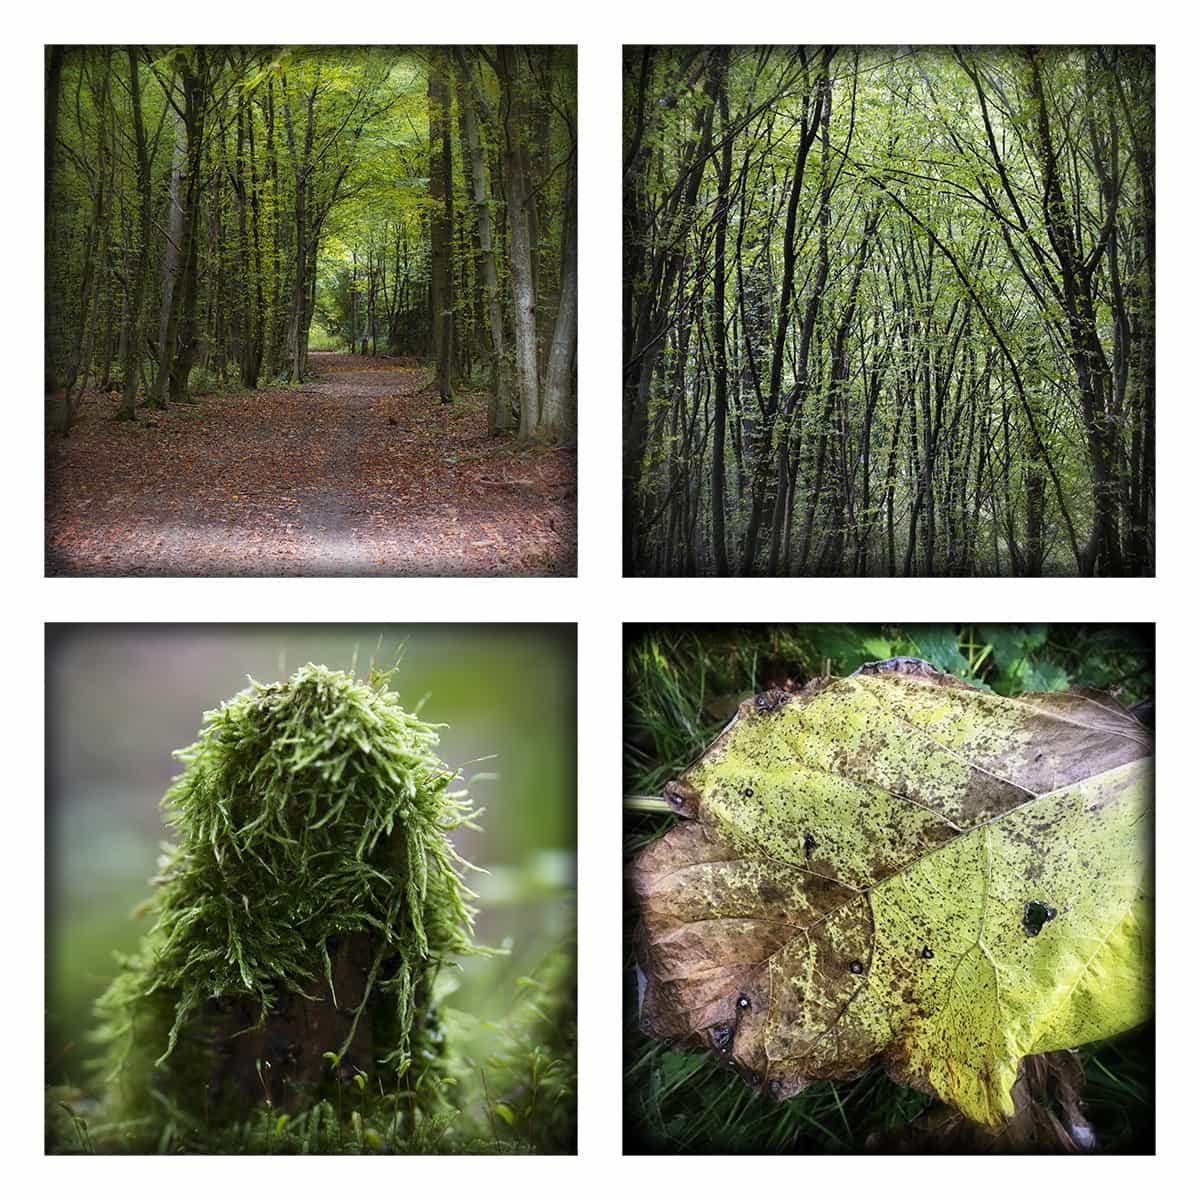 MAGIC FOREST XLVI